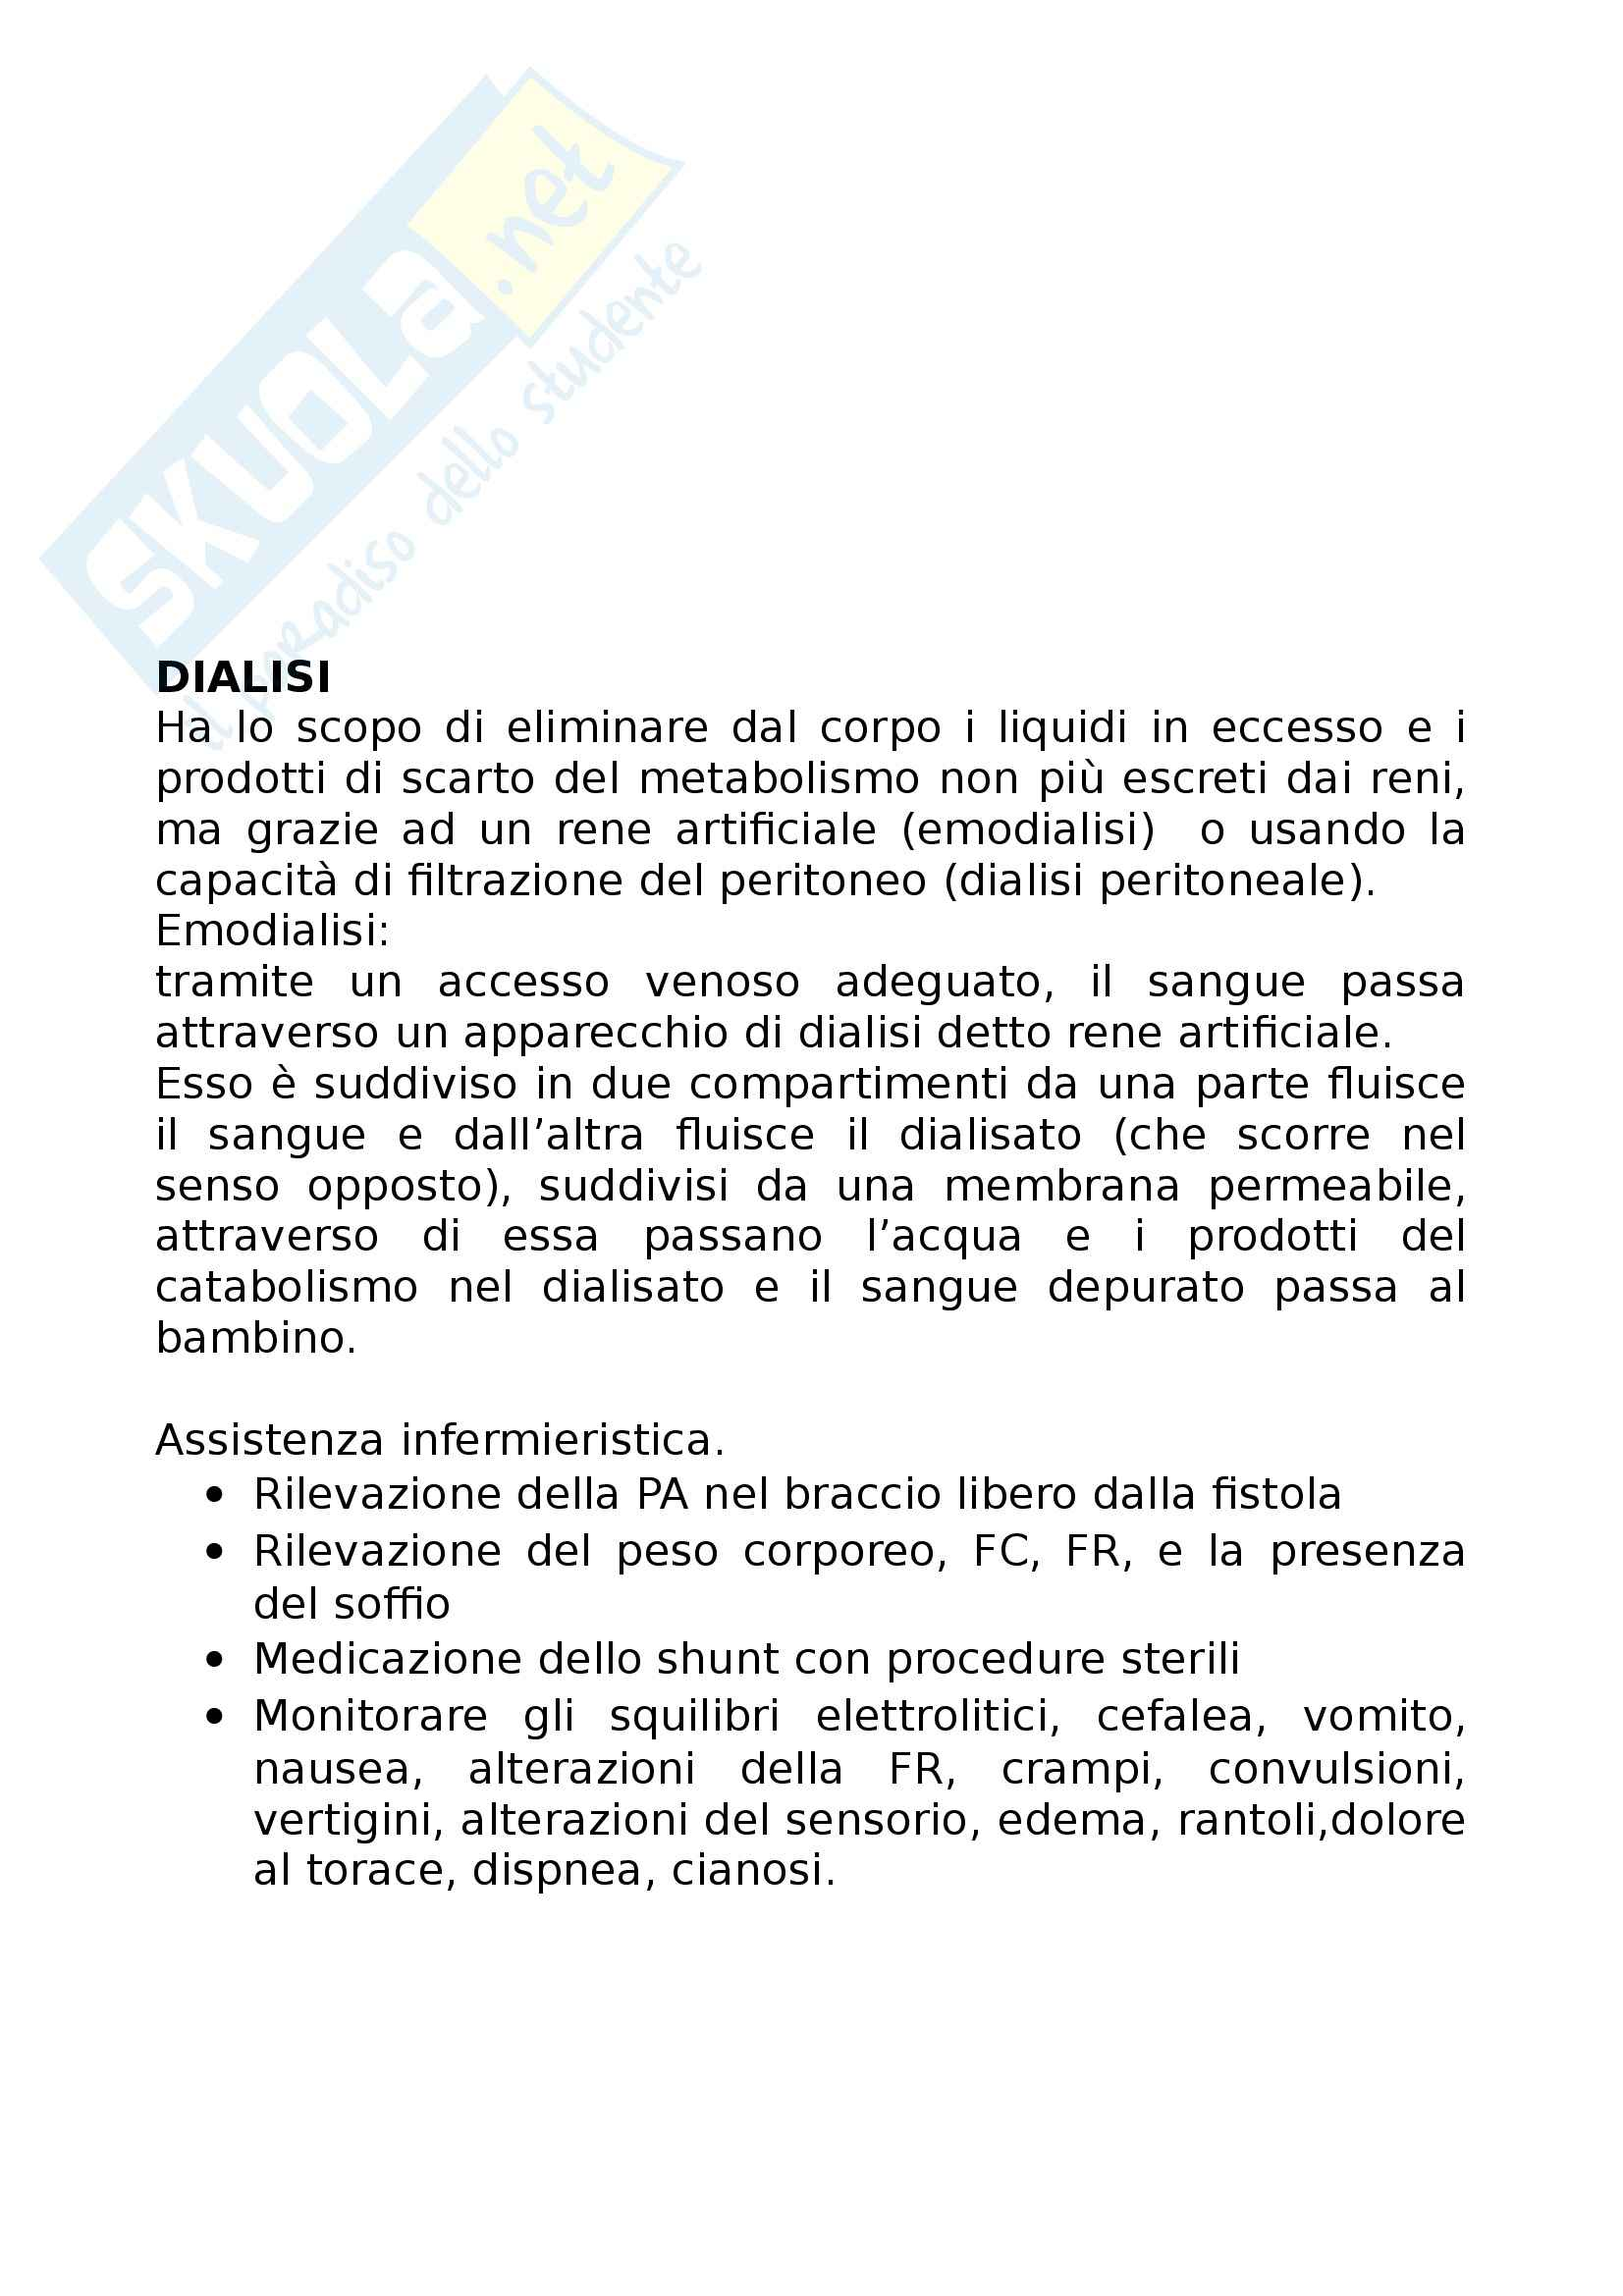 Infermieristica clinica 2 - Appunti Pag. 26